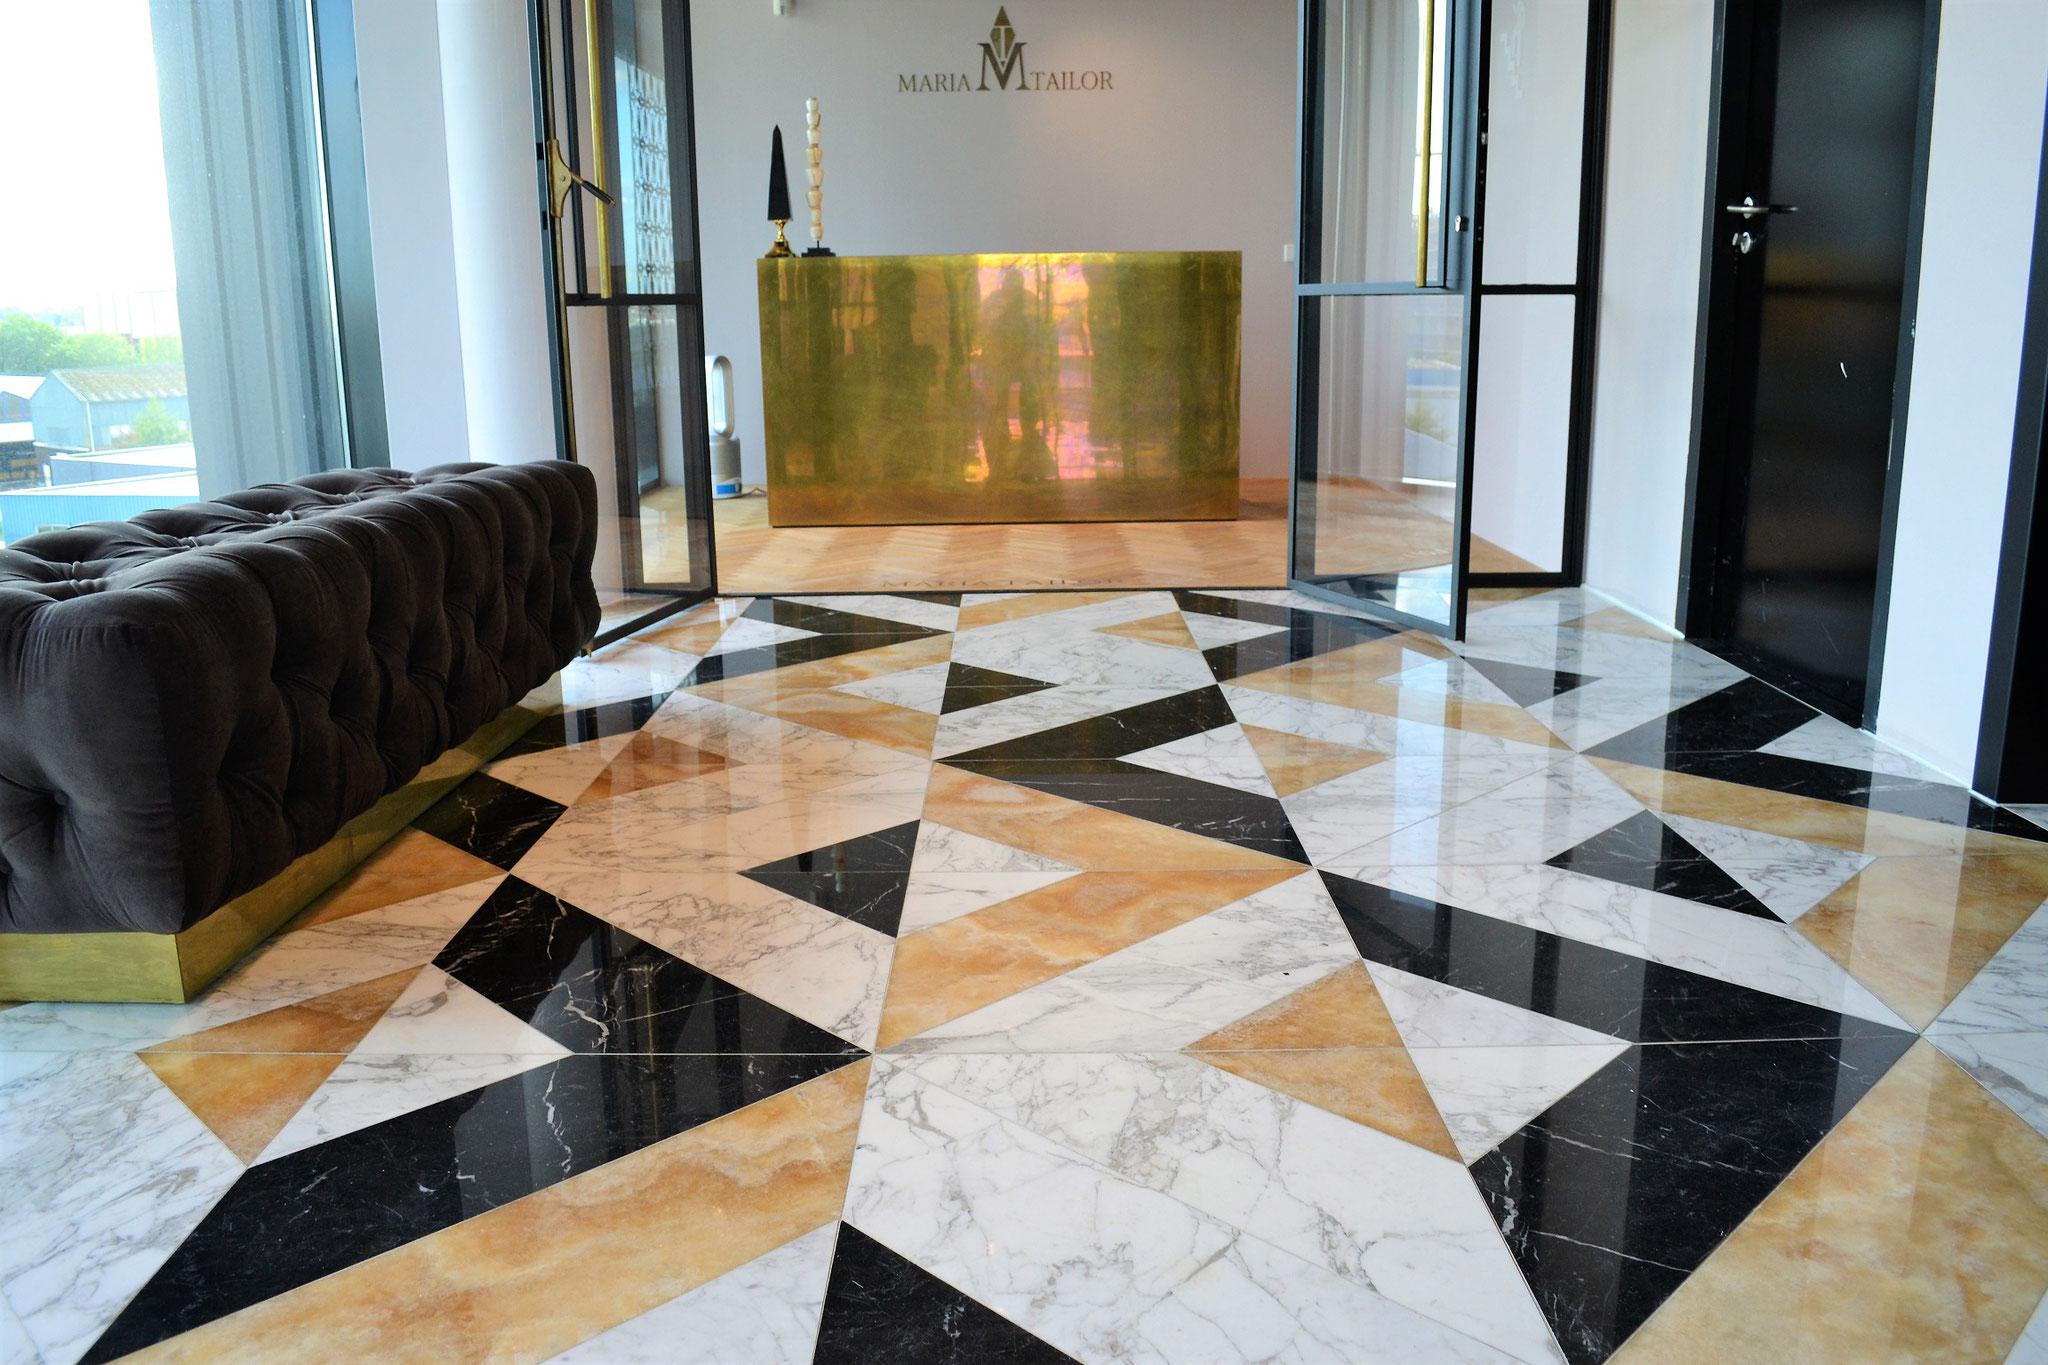 Mosaic marble, Maria Tailor HQ